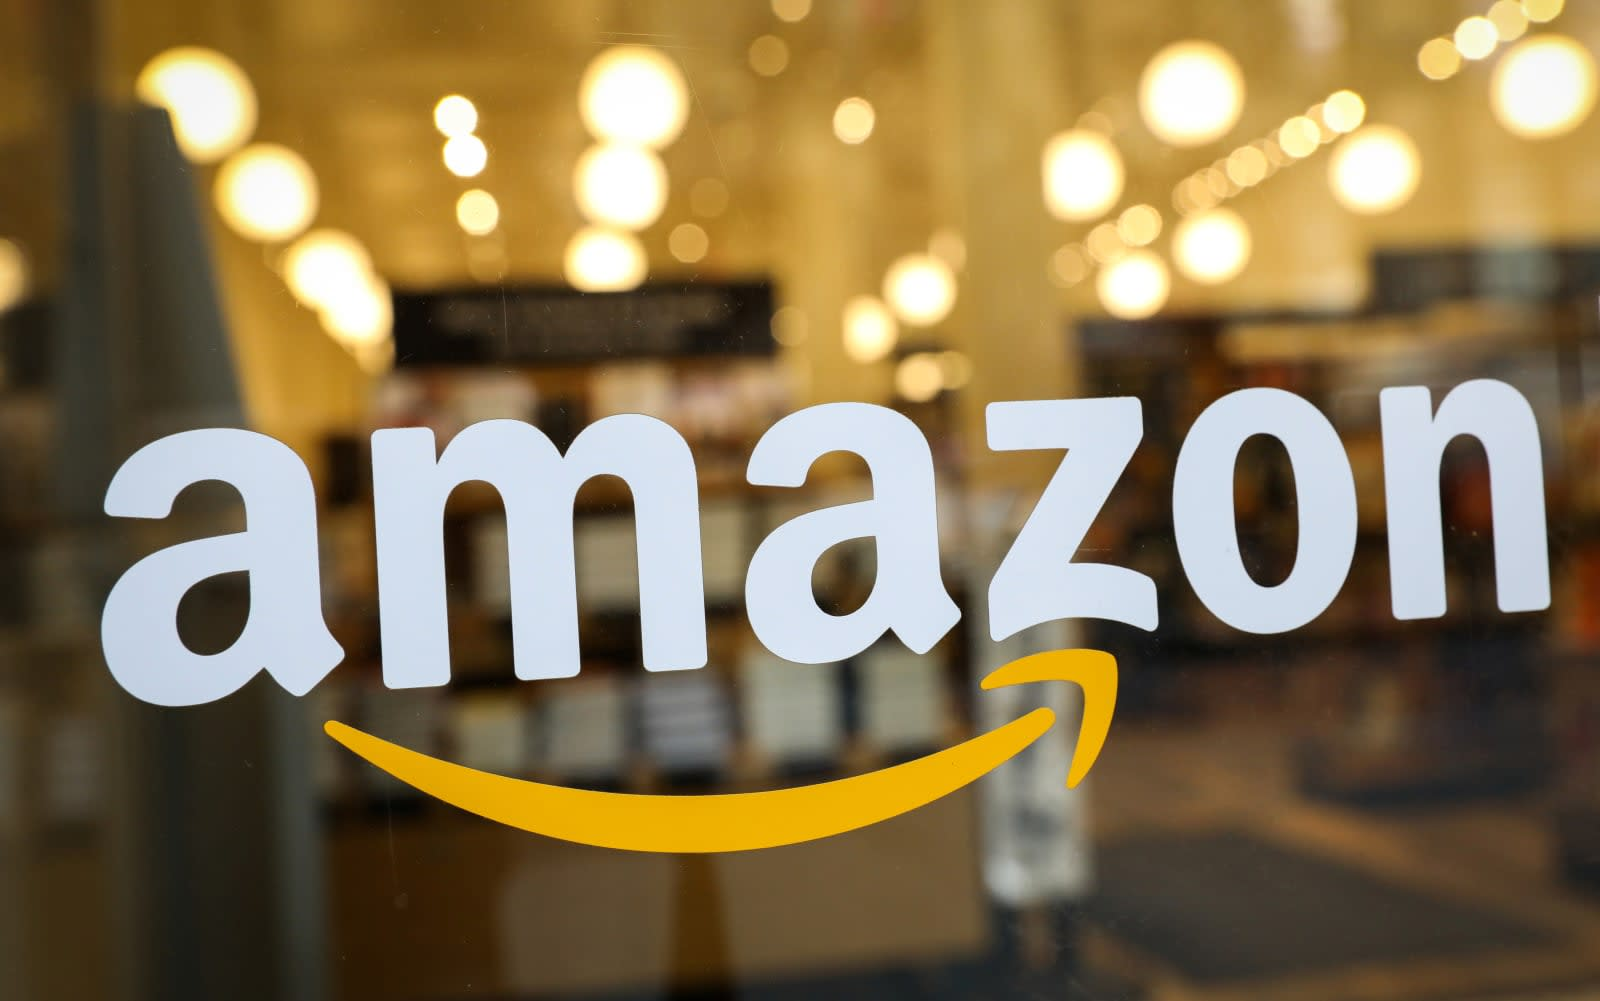 FTC cracks down on fake Amazon reviews in landmark case